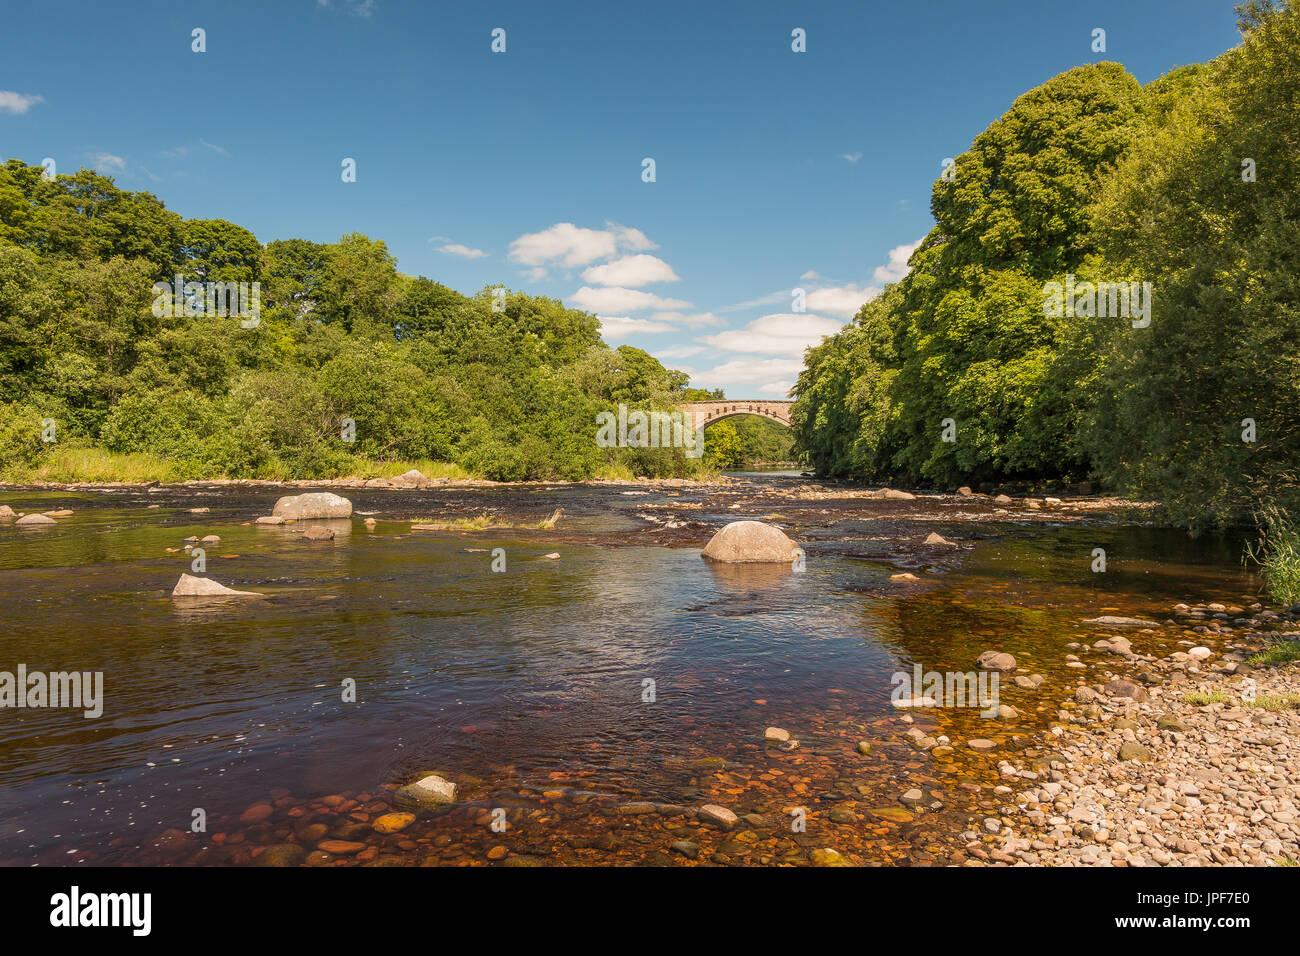 teesdale-landscape-winston-bridge-and-th